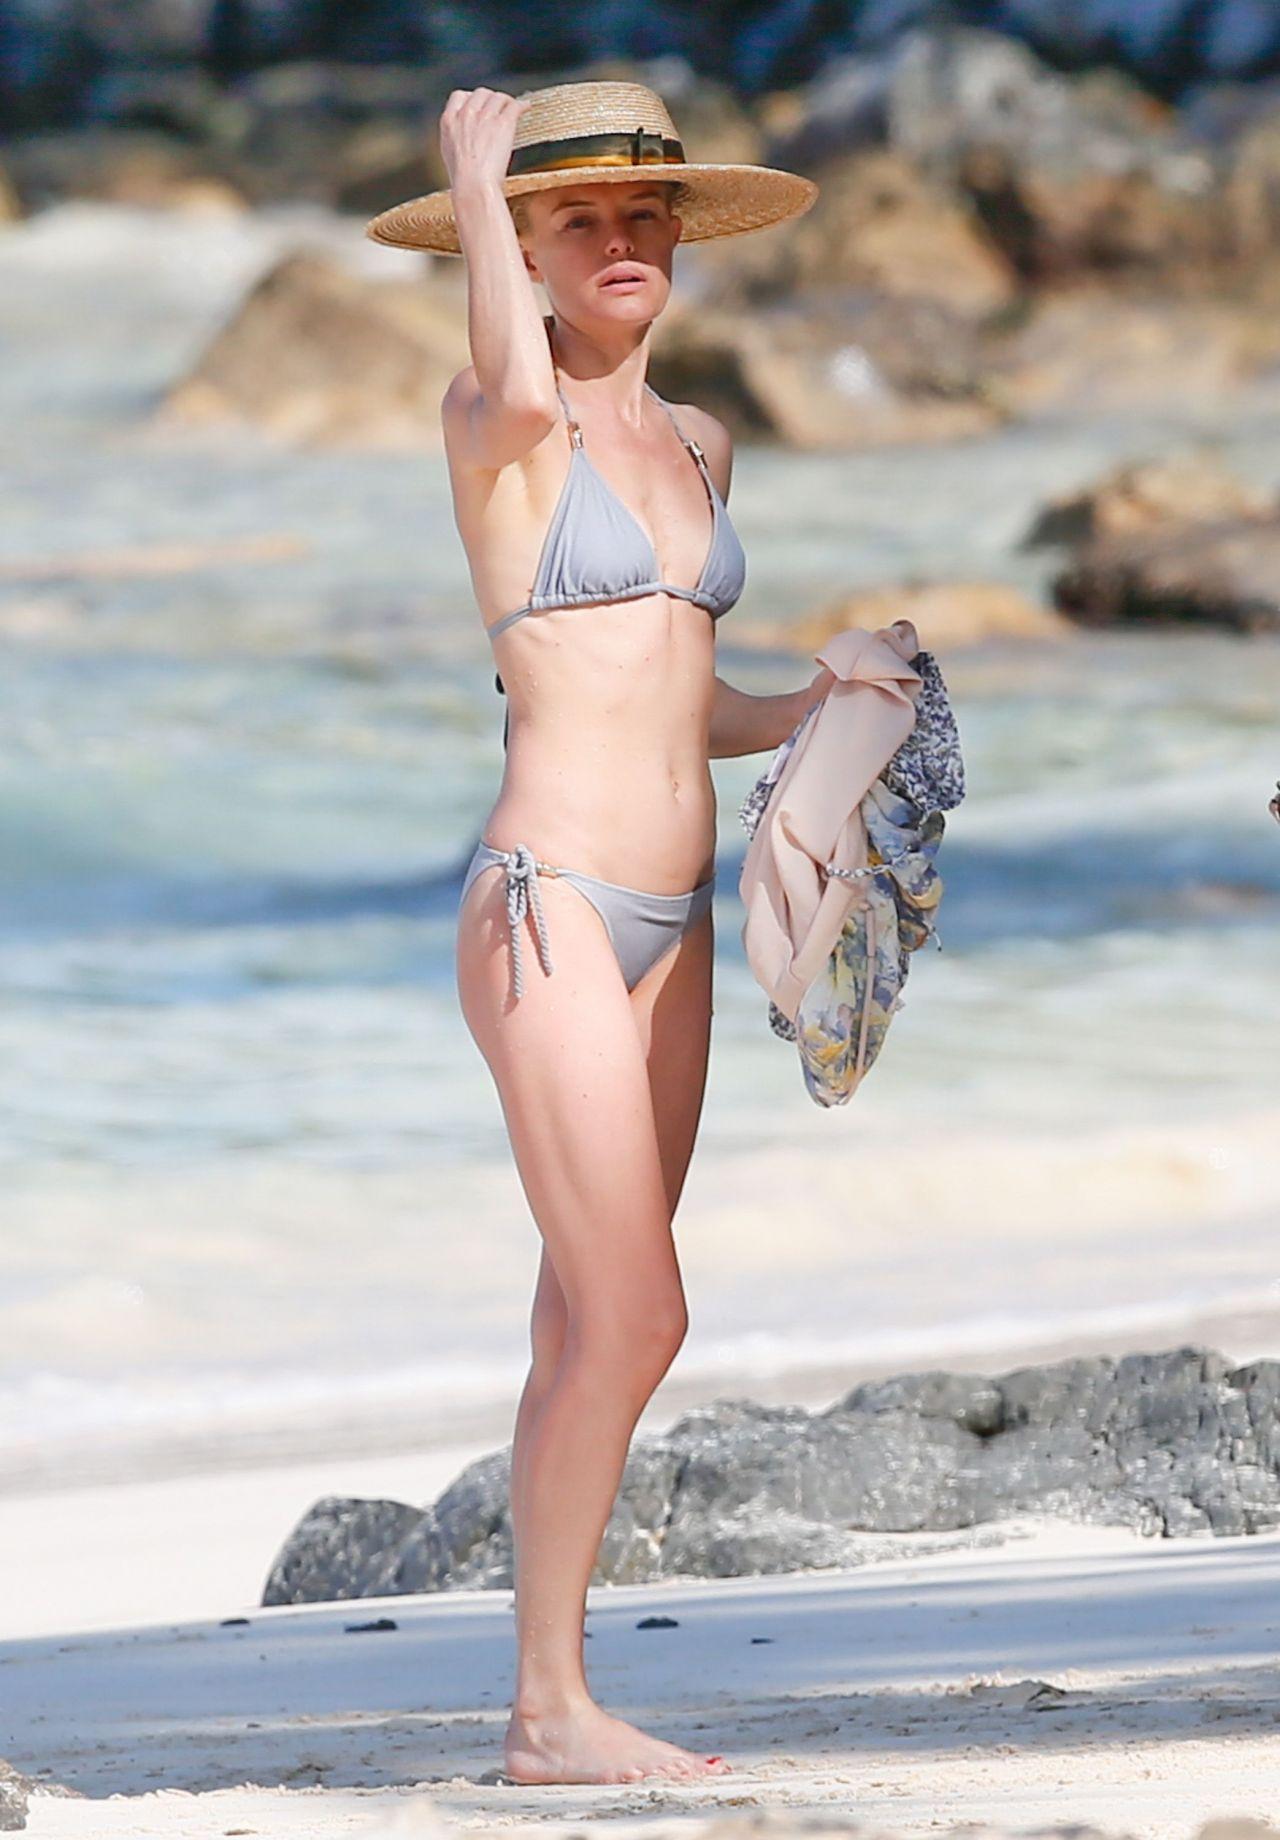 kate bosworth in a bikini at a beach in hawaii 4  2  2016